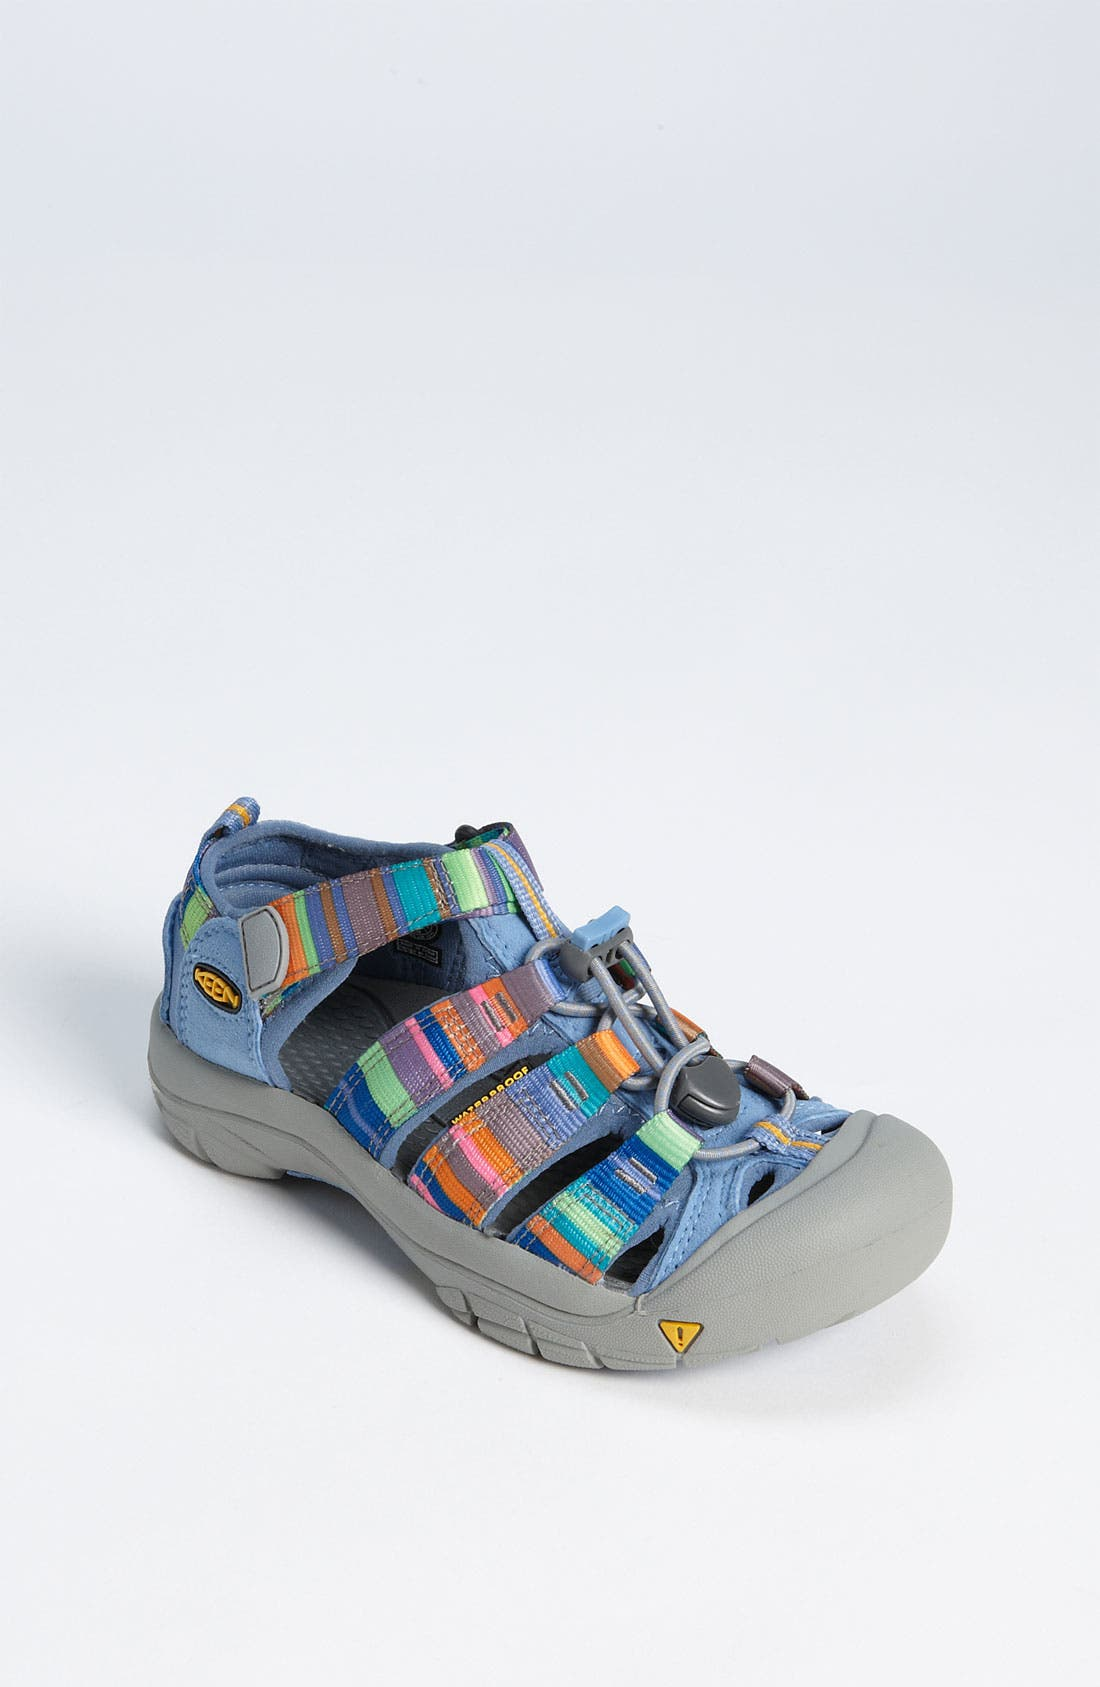 Alternate Image 1 Selected - Keen 'Newport H2' Sandal (Toddler, Little Kid & Big Kid)